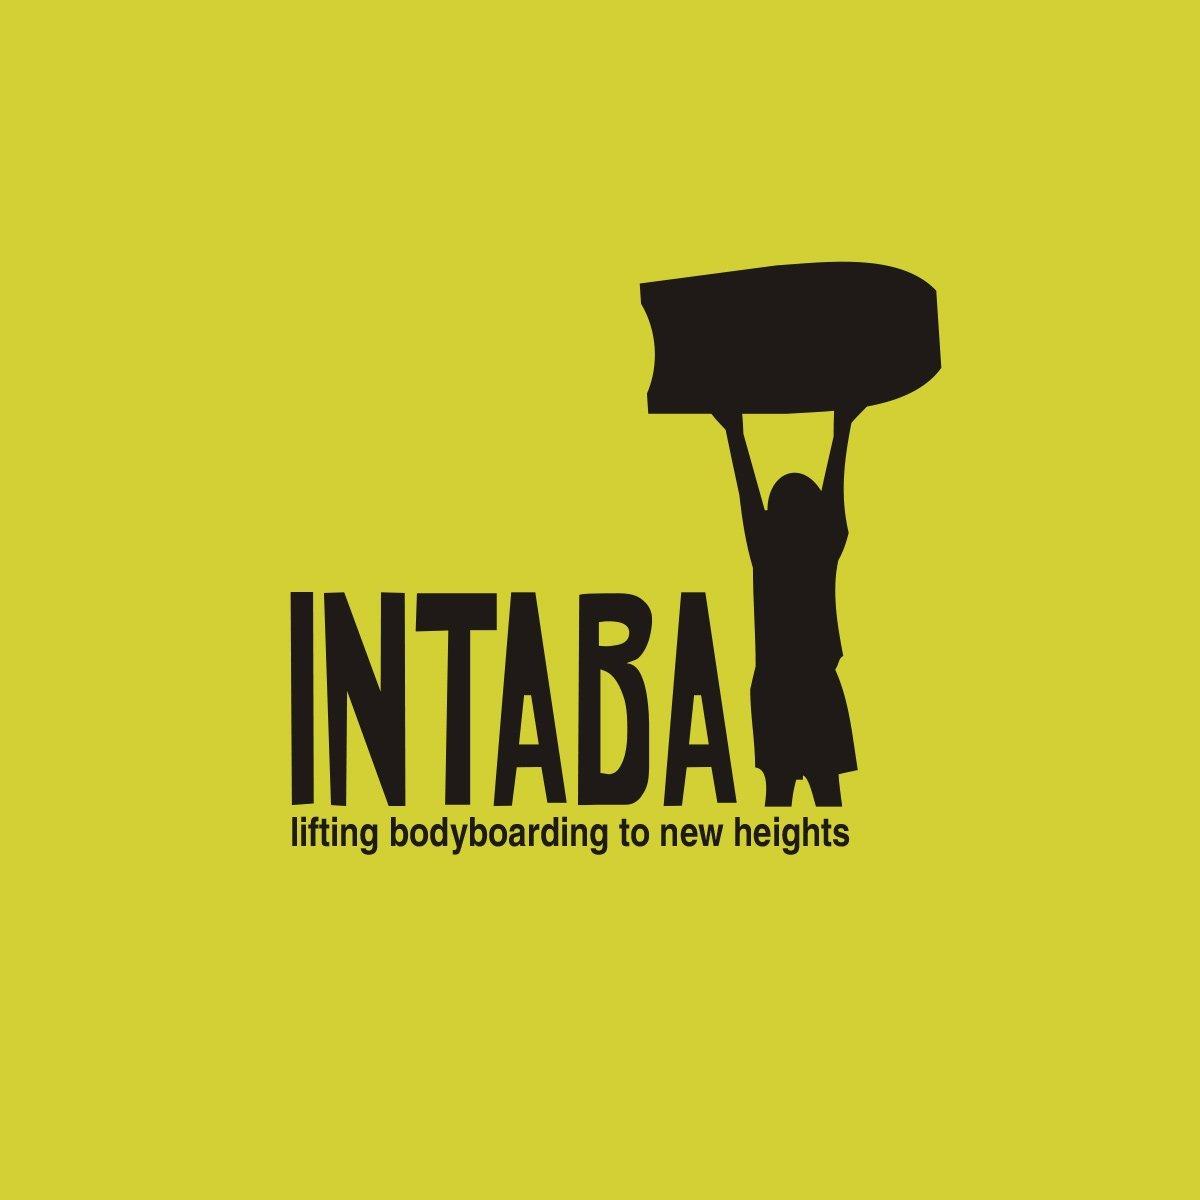 Intaba logo